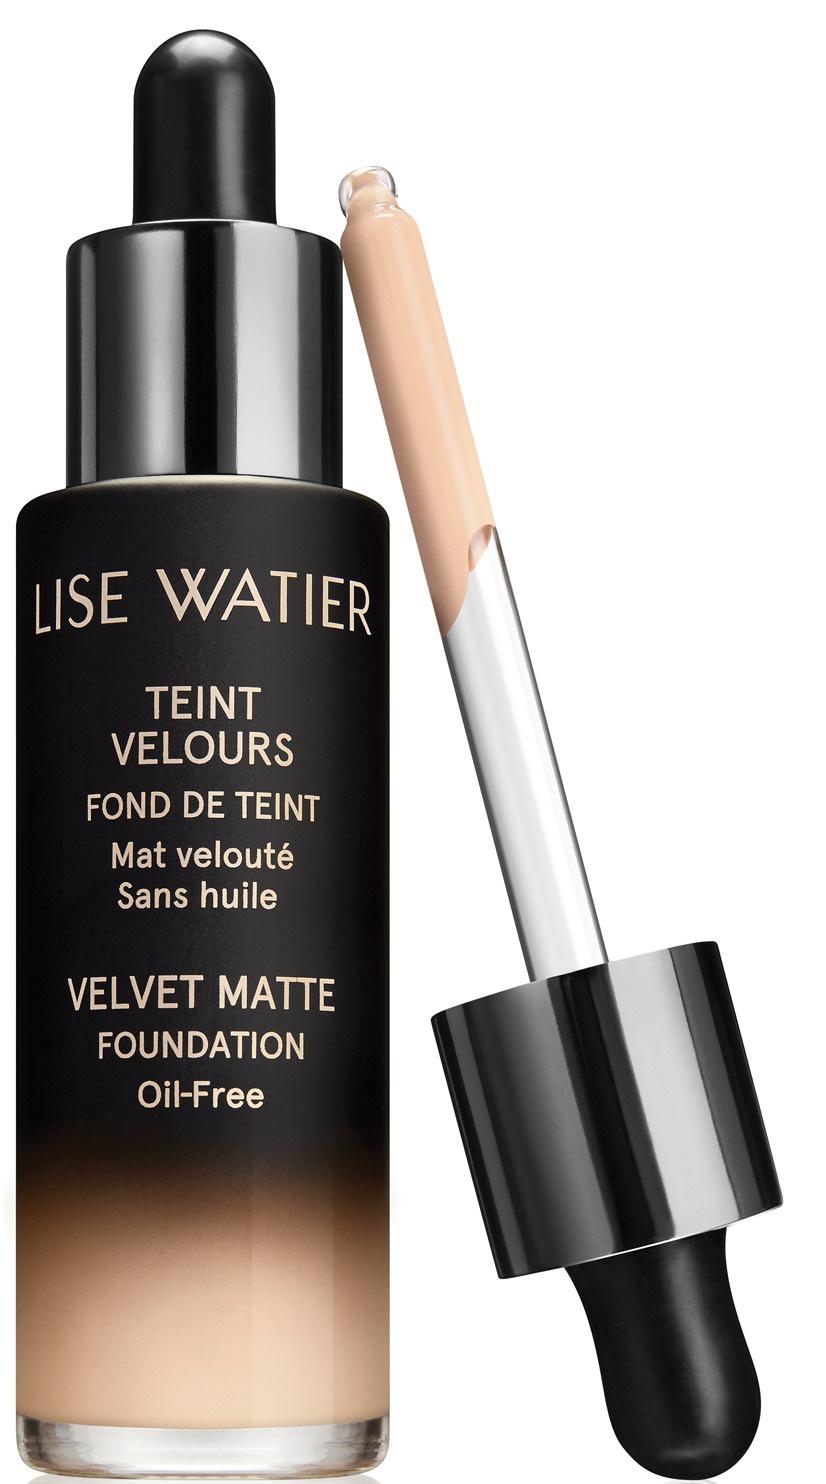 Lise Watier Teint Velours